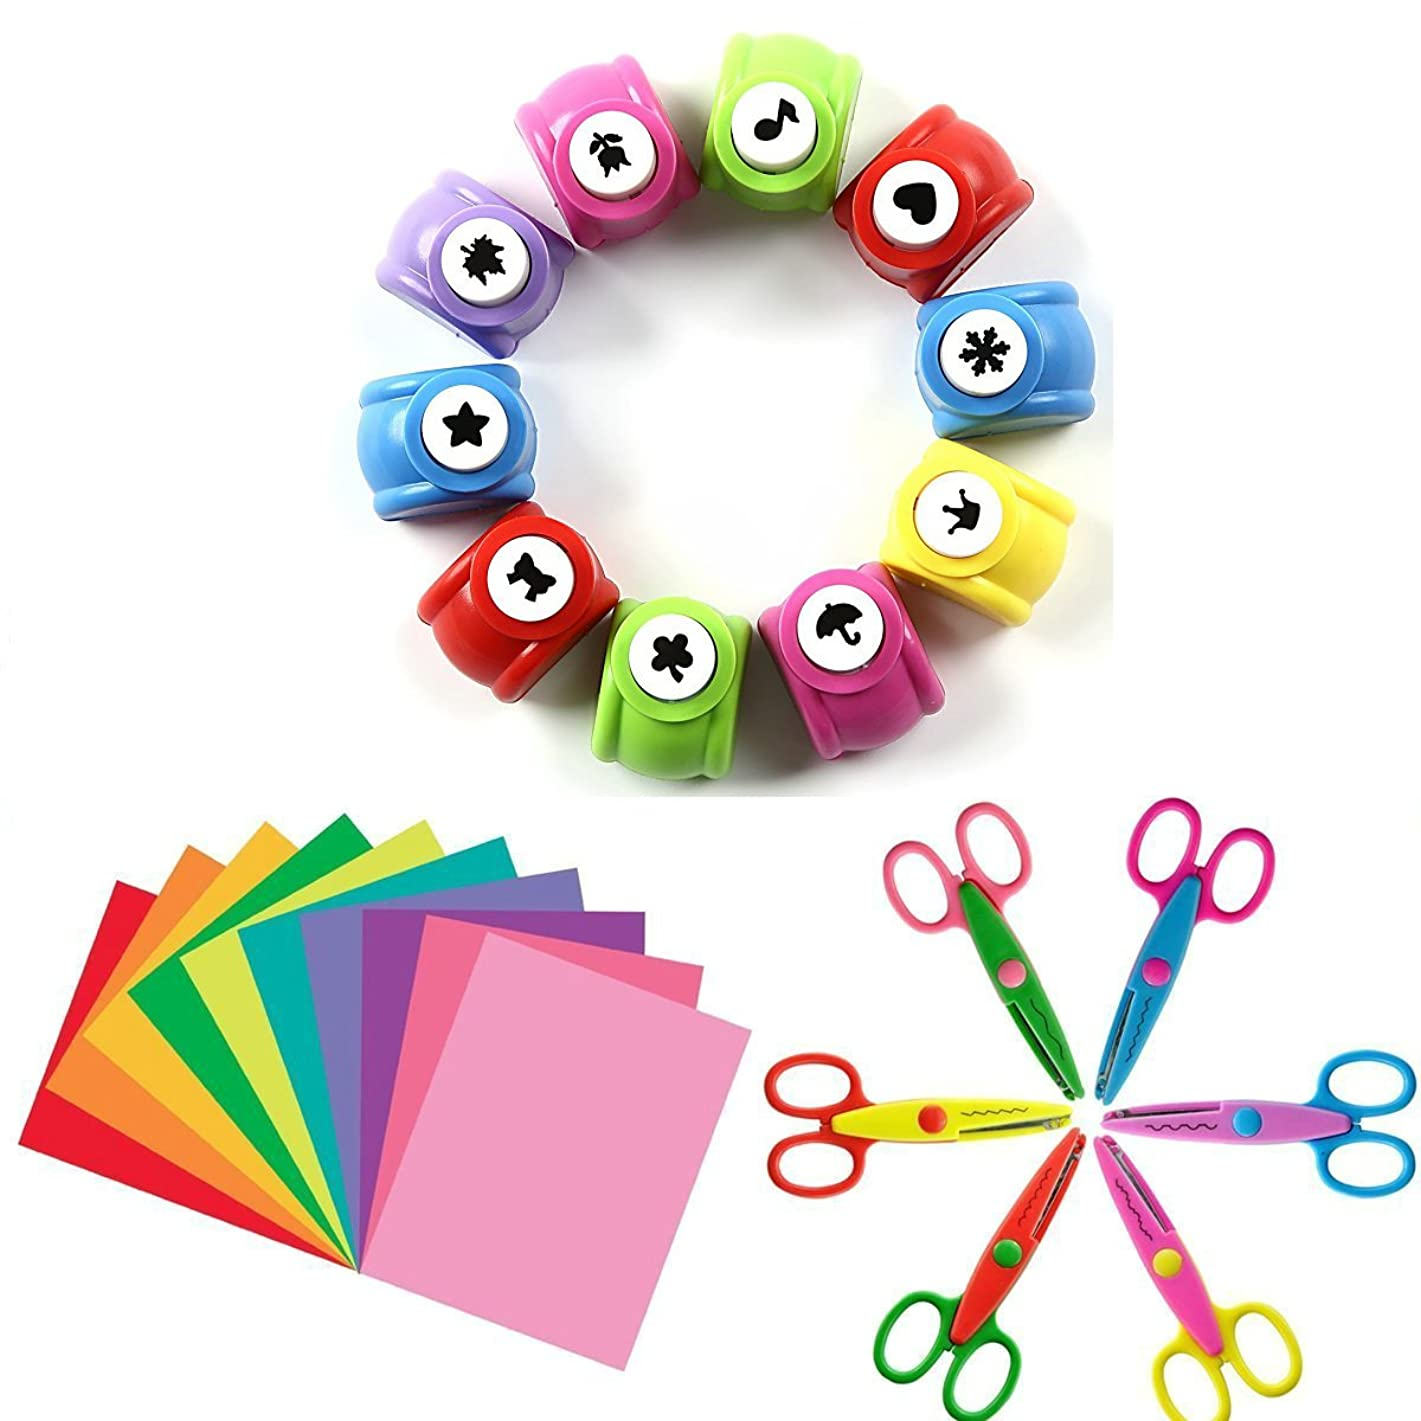 Since 10 PCS Craft Punch + 6 PCS Creative Scissors + 50 PCS Colorful Self Adhesive Paper for Card Scrapbooking Engraving Kid Cut DIY Handmade